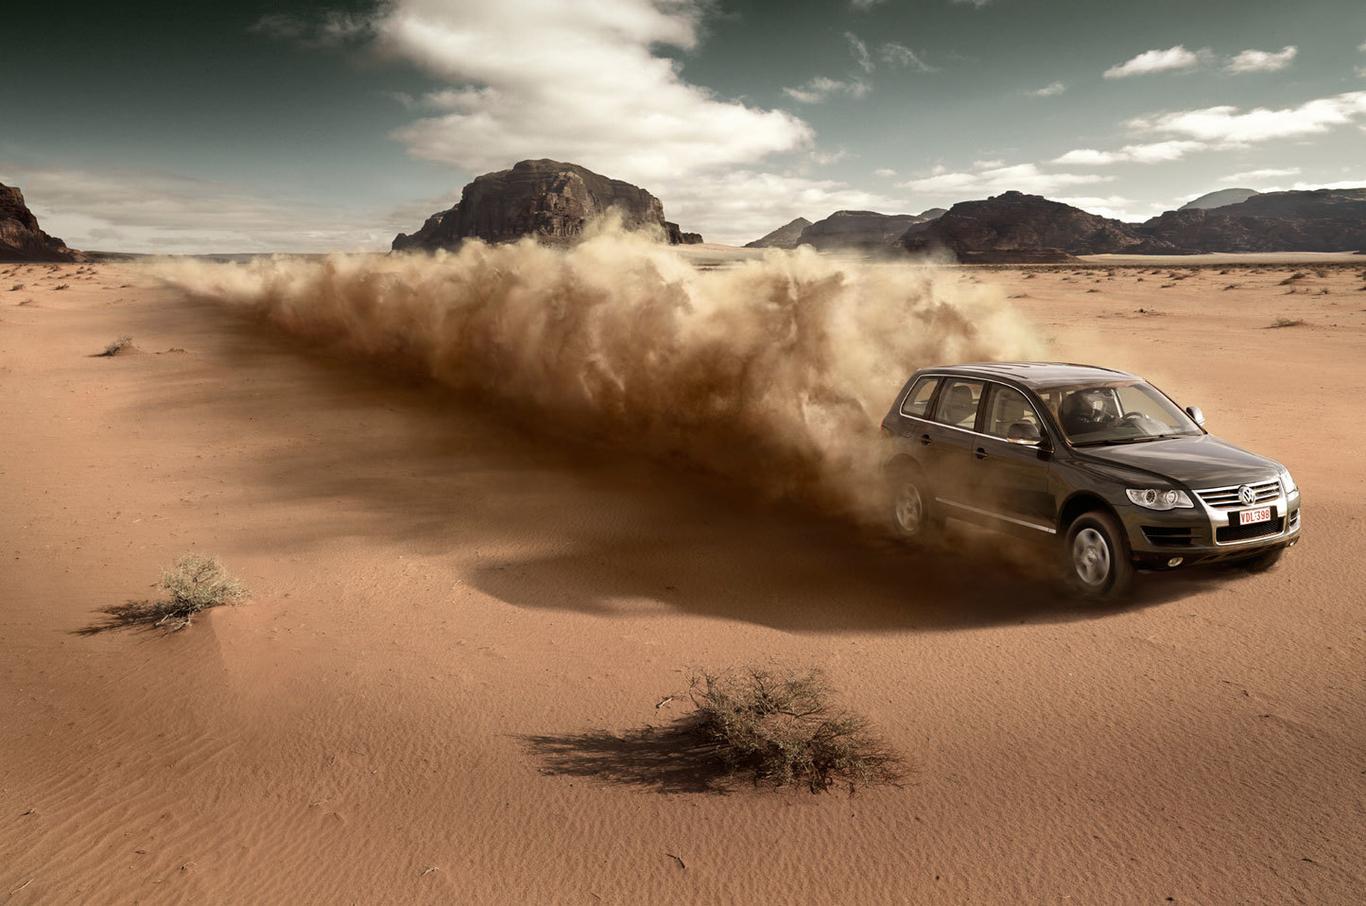 Tredistudio dust desert knight 1 7a1118c3 yq1v